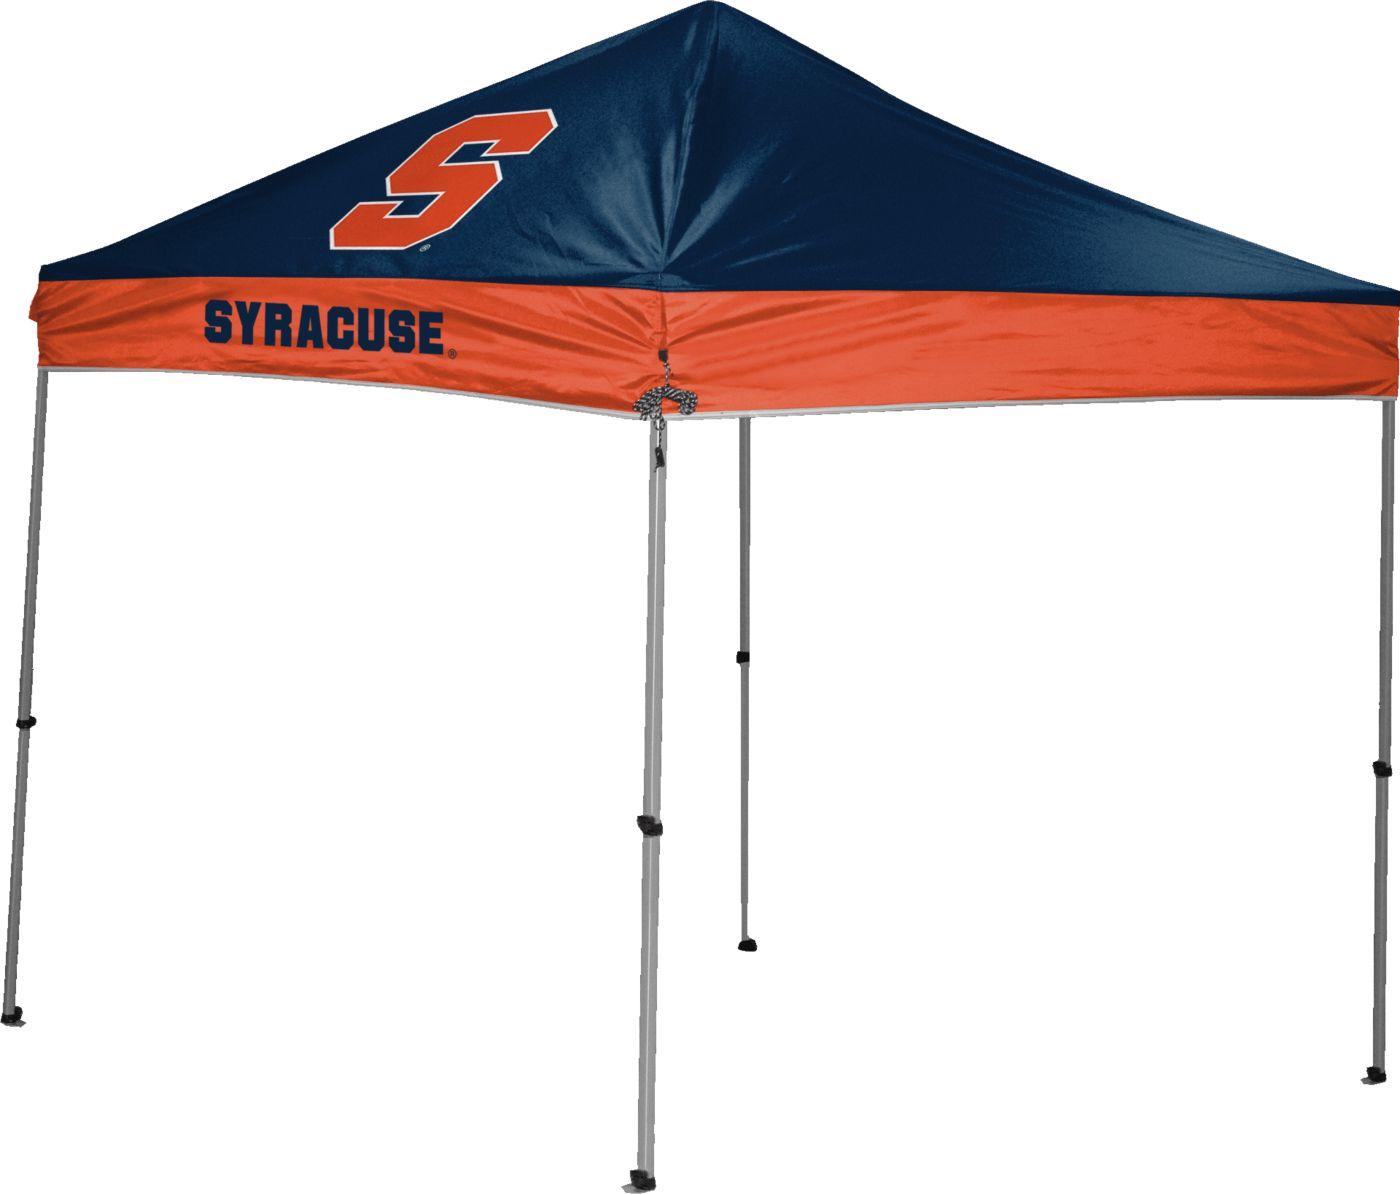 Rawlings Syracuse Orange 9' x 9' Sideline Canopy Tent